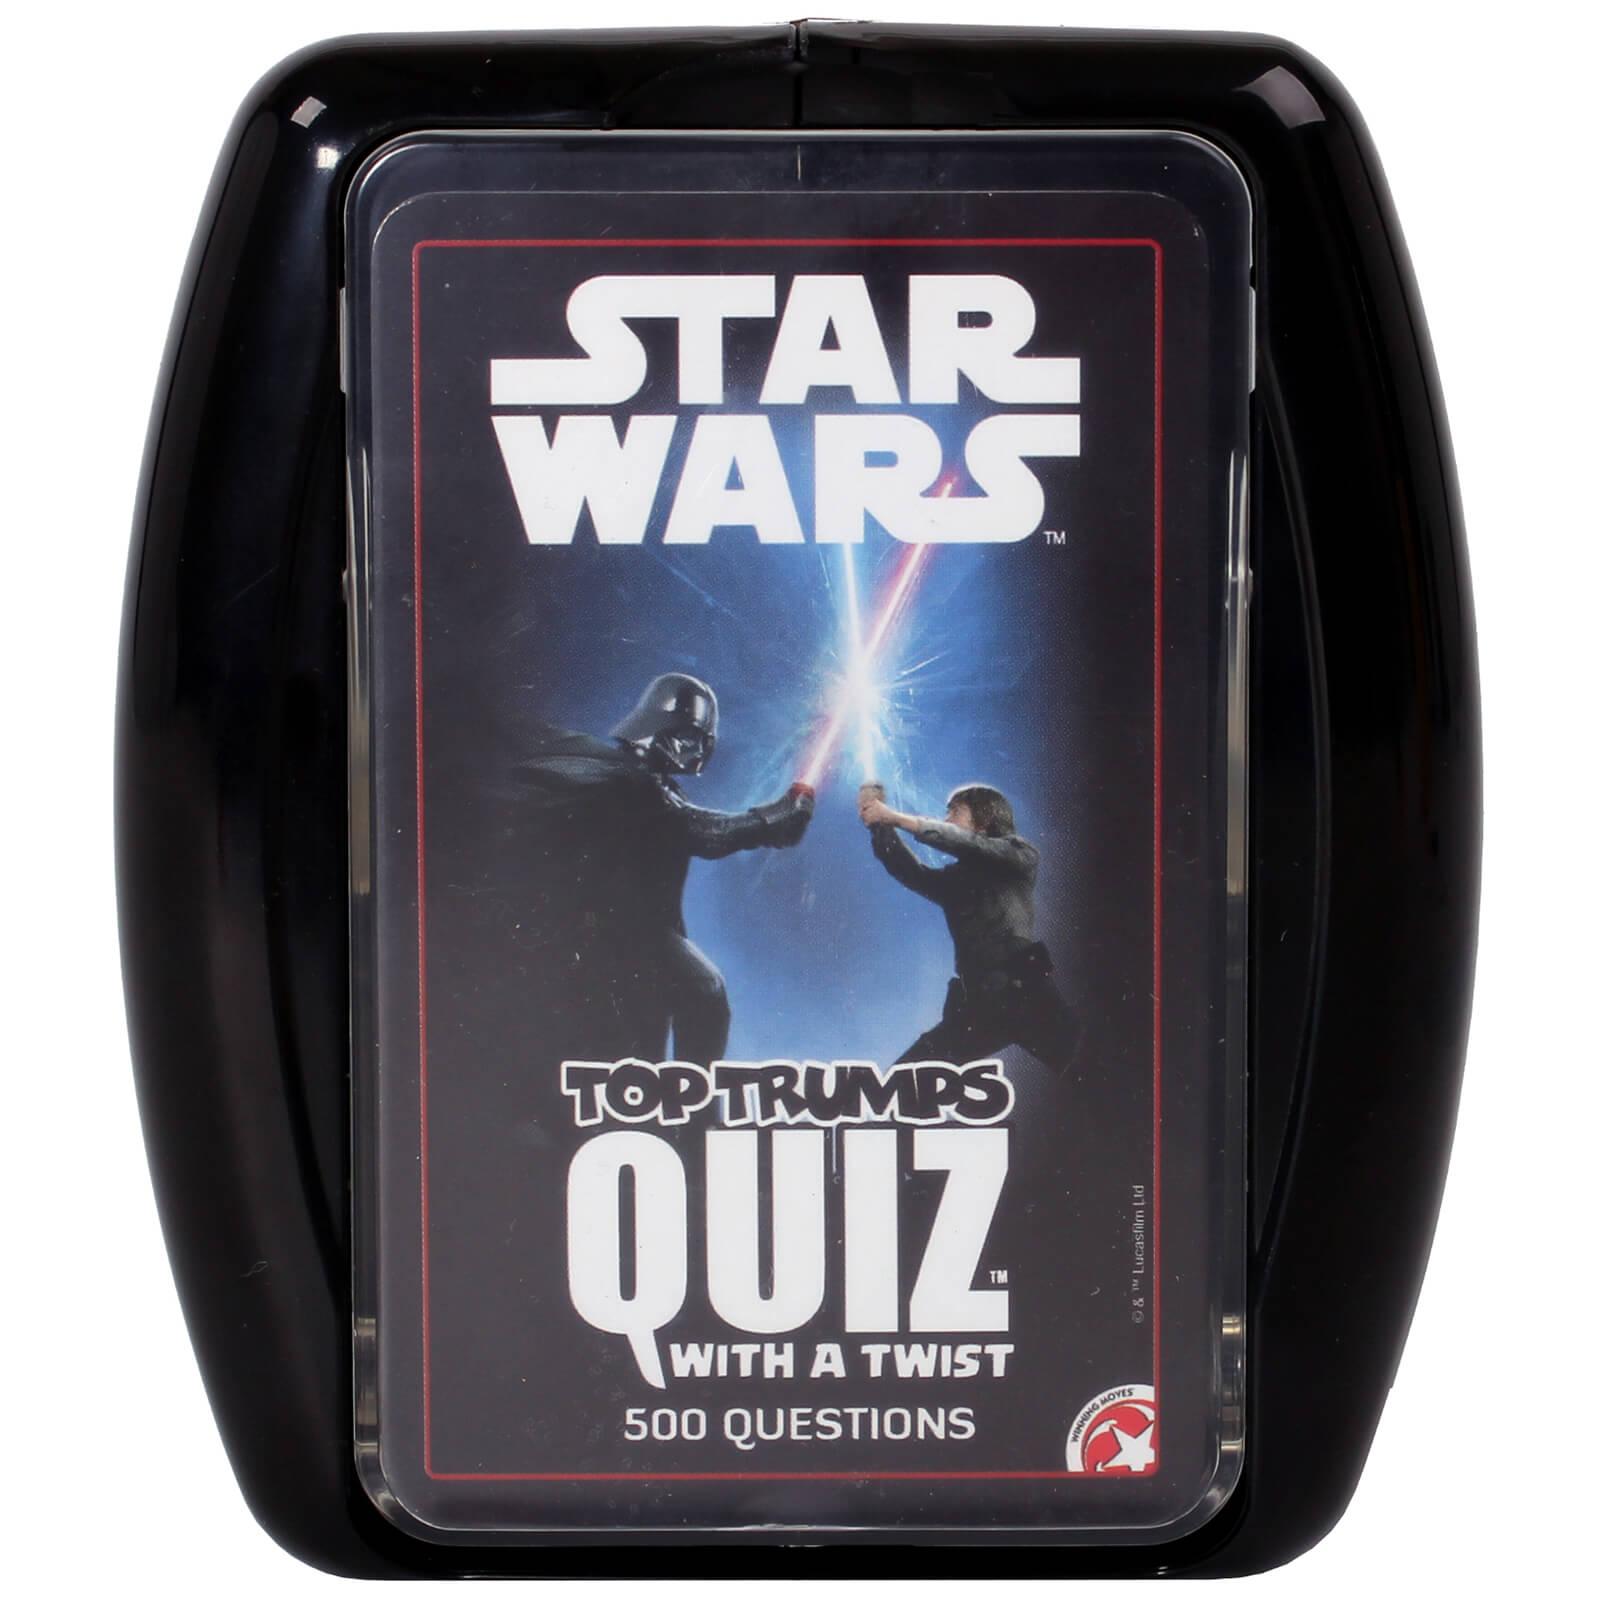 Image of Top Trumps Quiz Game - Star Wars Edition